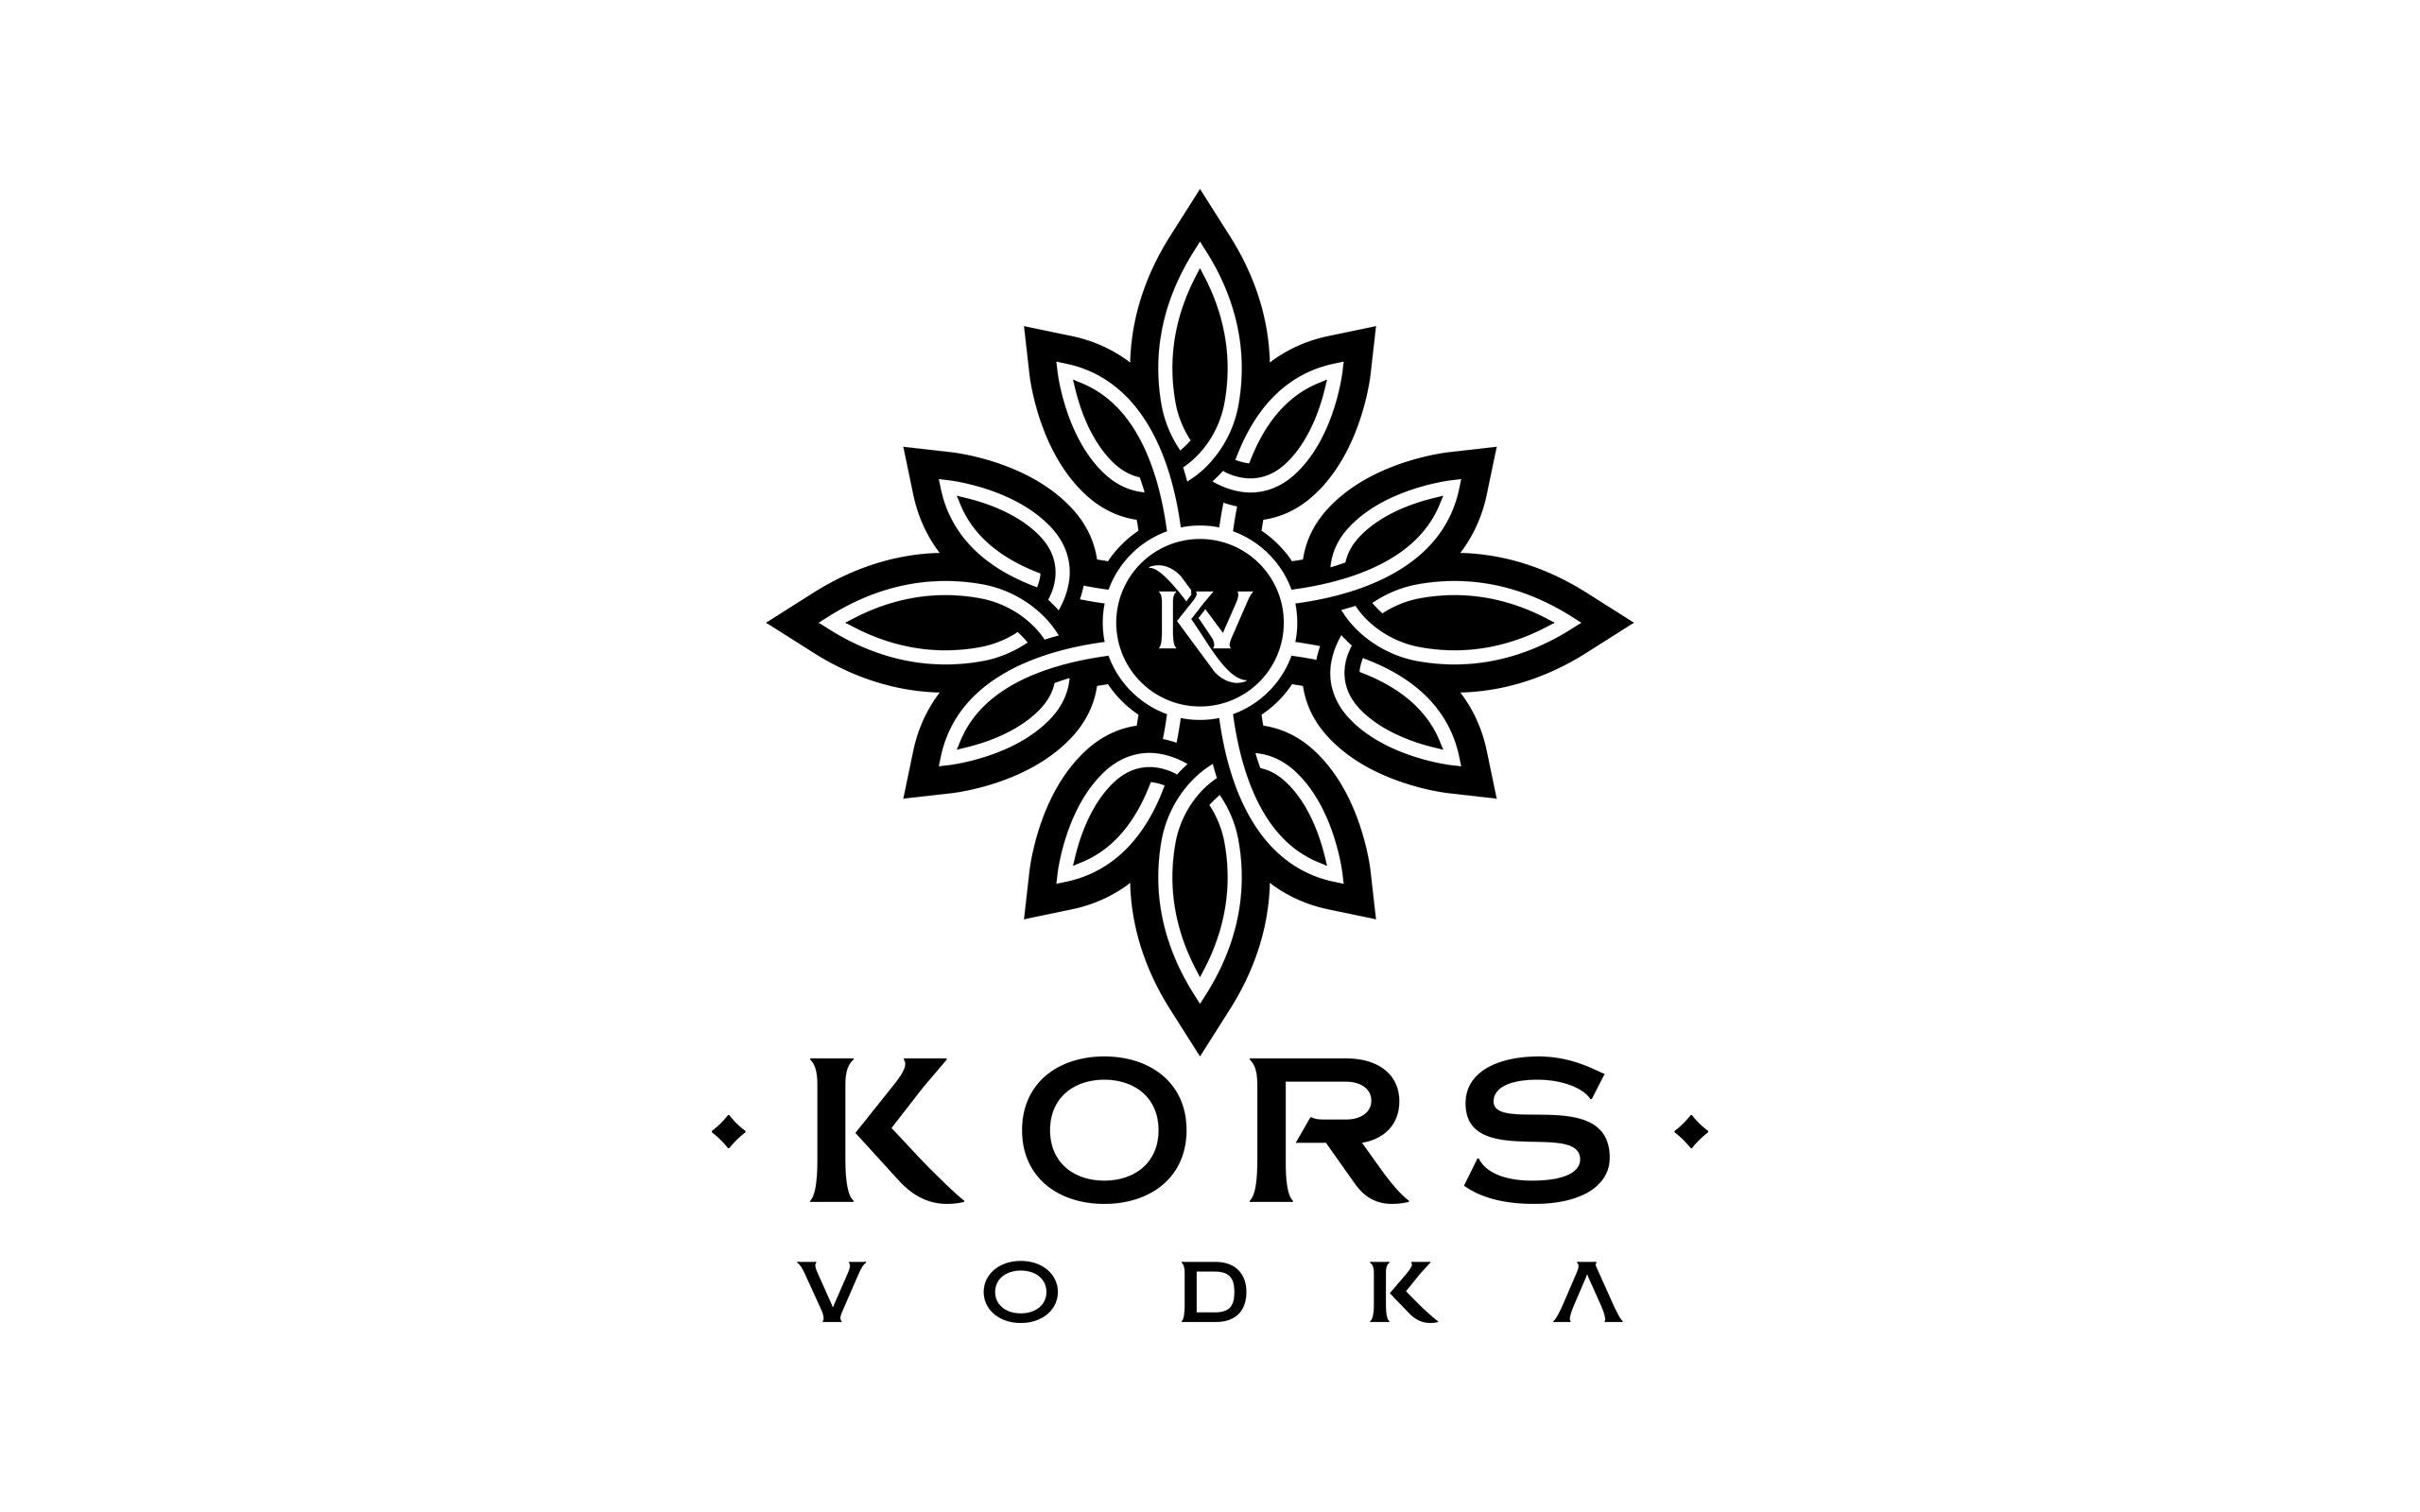 kors vodka media kit pdf and images